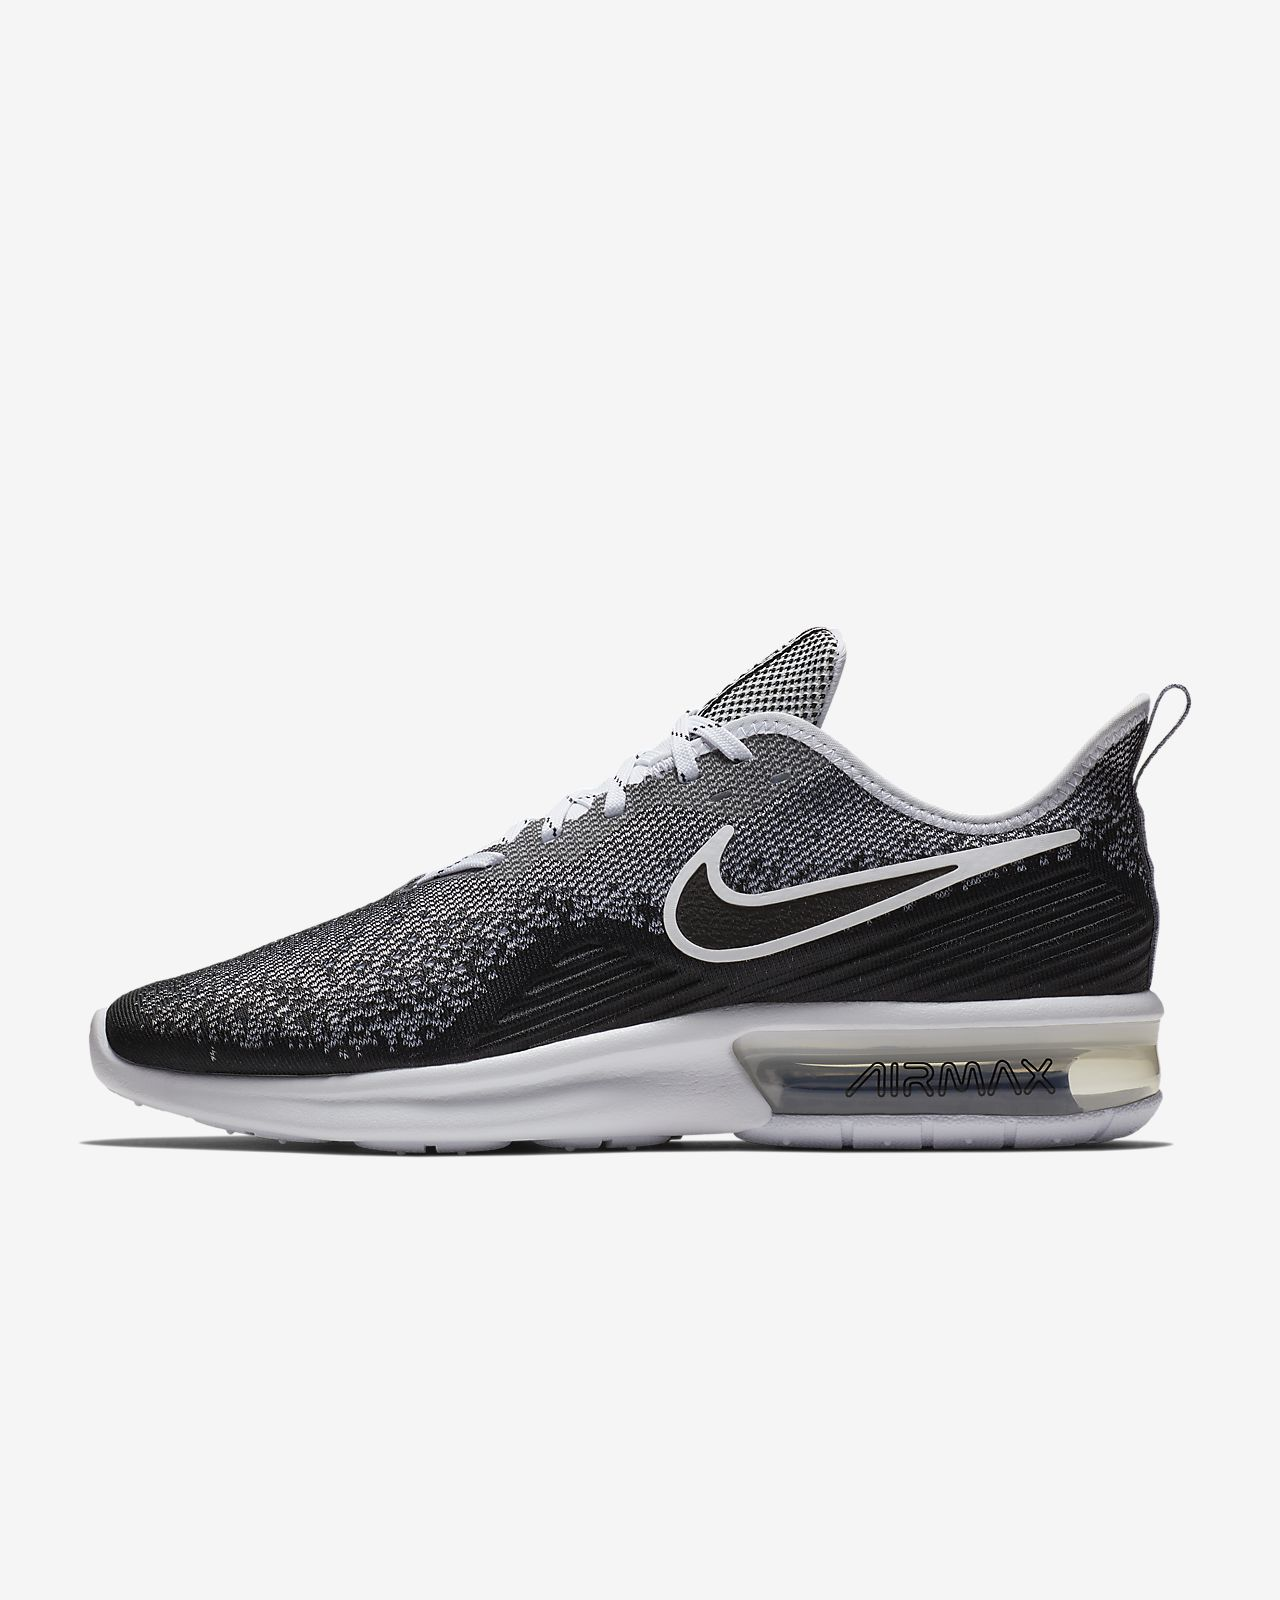 differently bf05f 42183 ... Sko Nike Air Max Sequent 4 för män